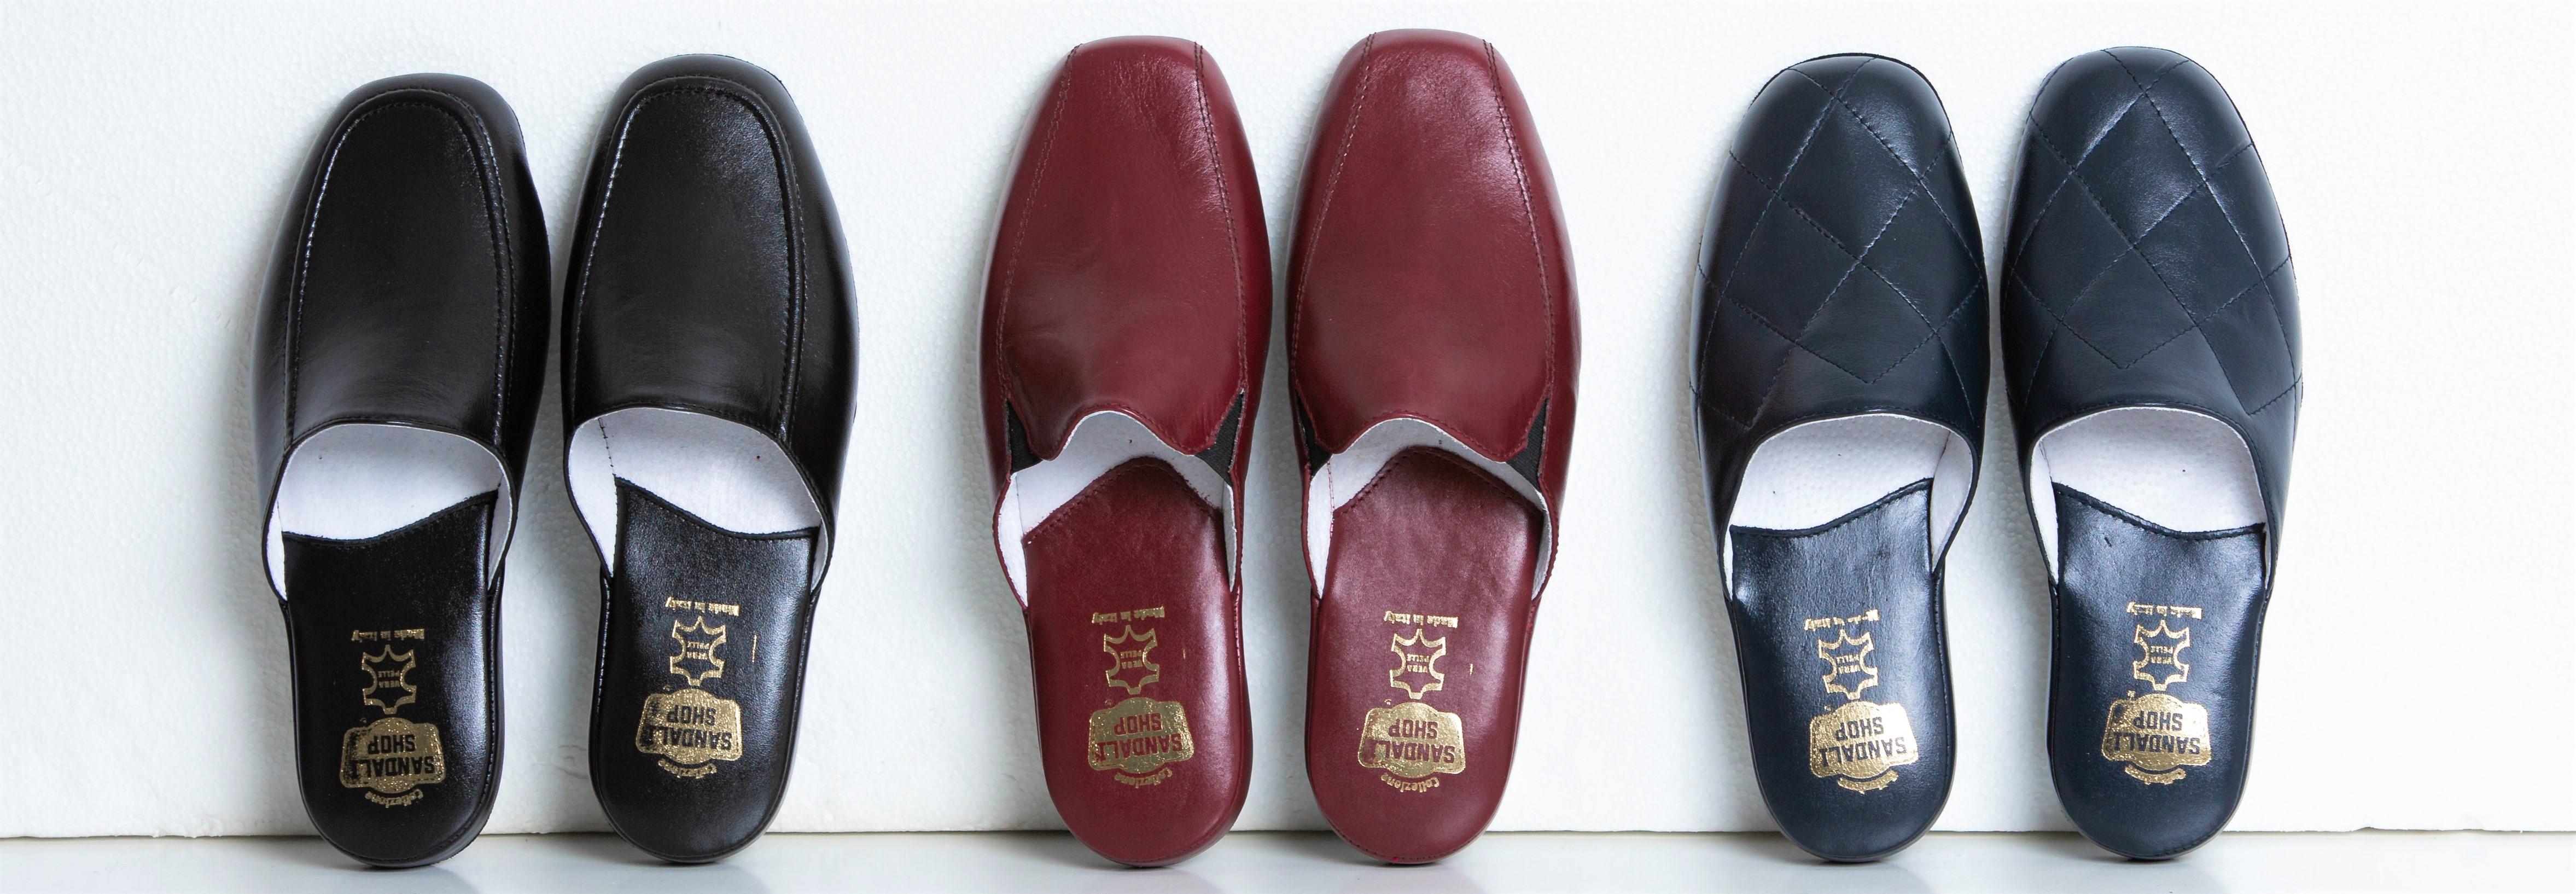 Pantofole Uomo Pelle